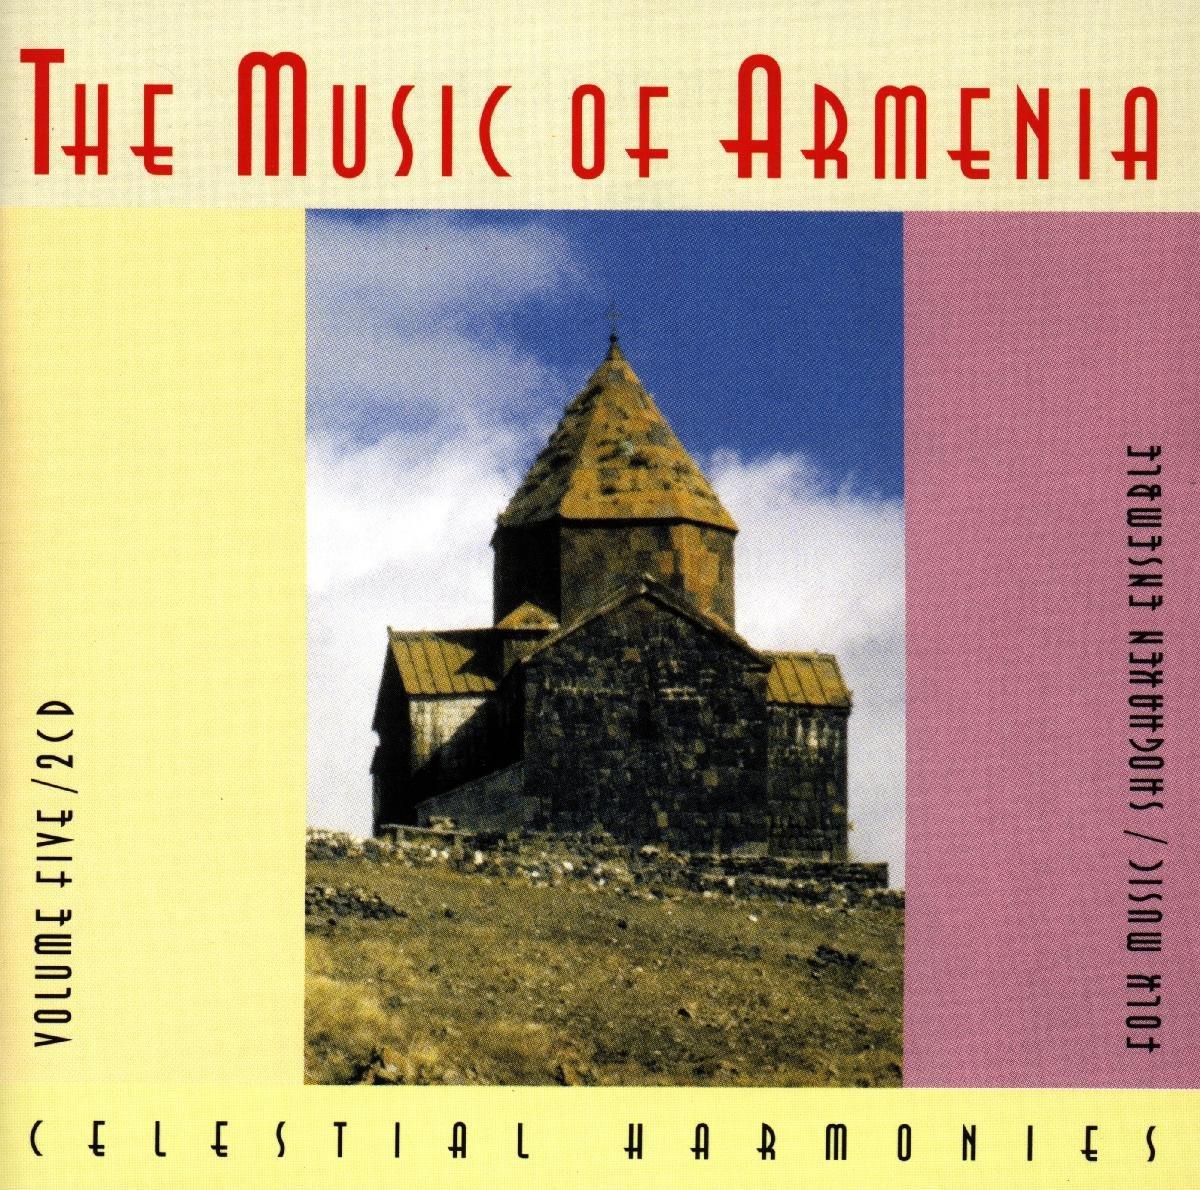 The Music of Armenia, Volume 5: Folk Music